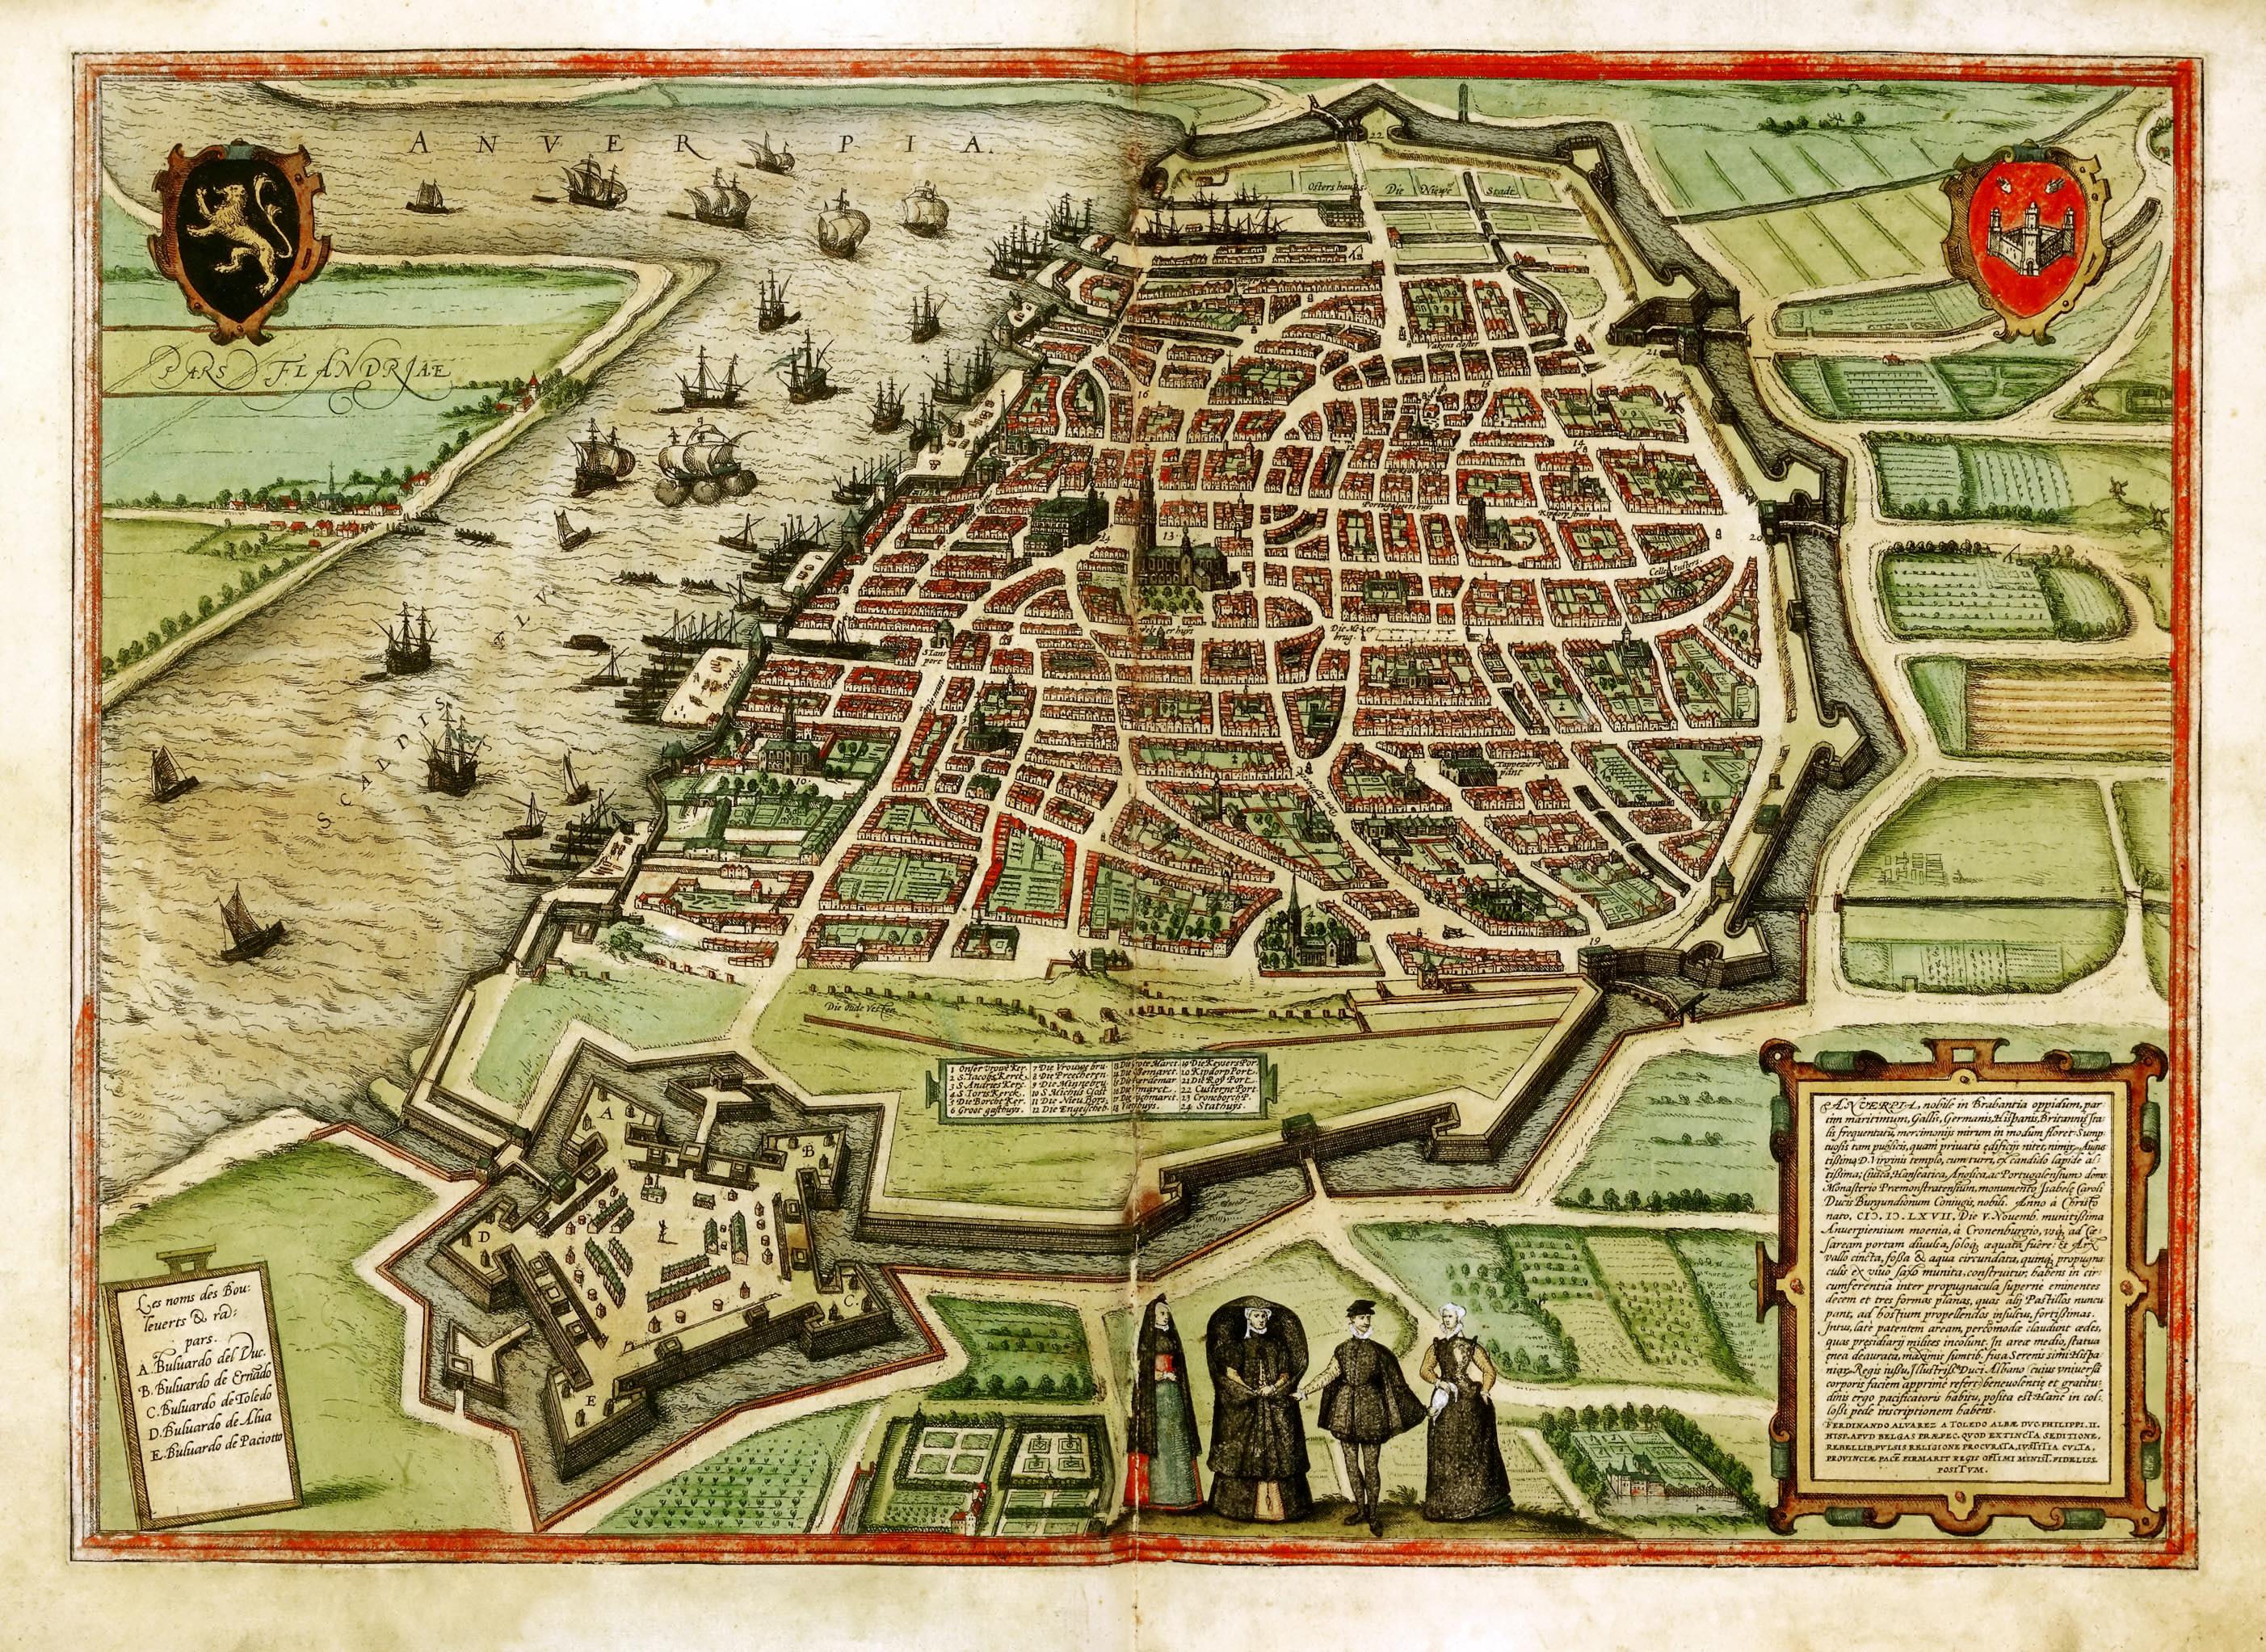 Antwerp Map Europe.File Antwerp Belgium Braun And Hogenberg 1572 79 Jpg Wikimedia